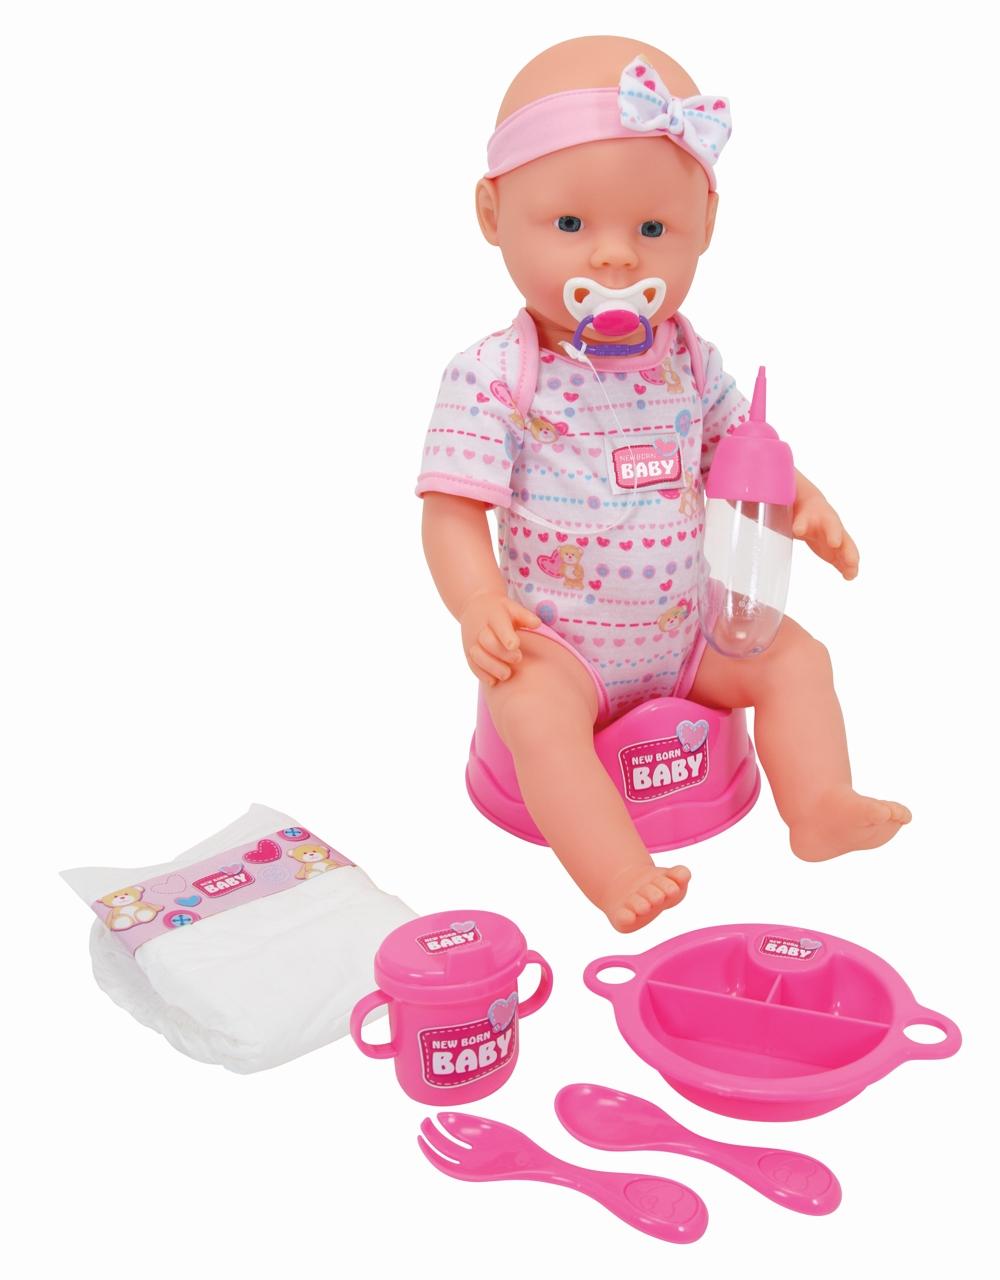 simba toys new born baby drink wet preisvergleich. Black Bedroom Furniture Sets. Home Design Ideas